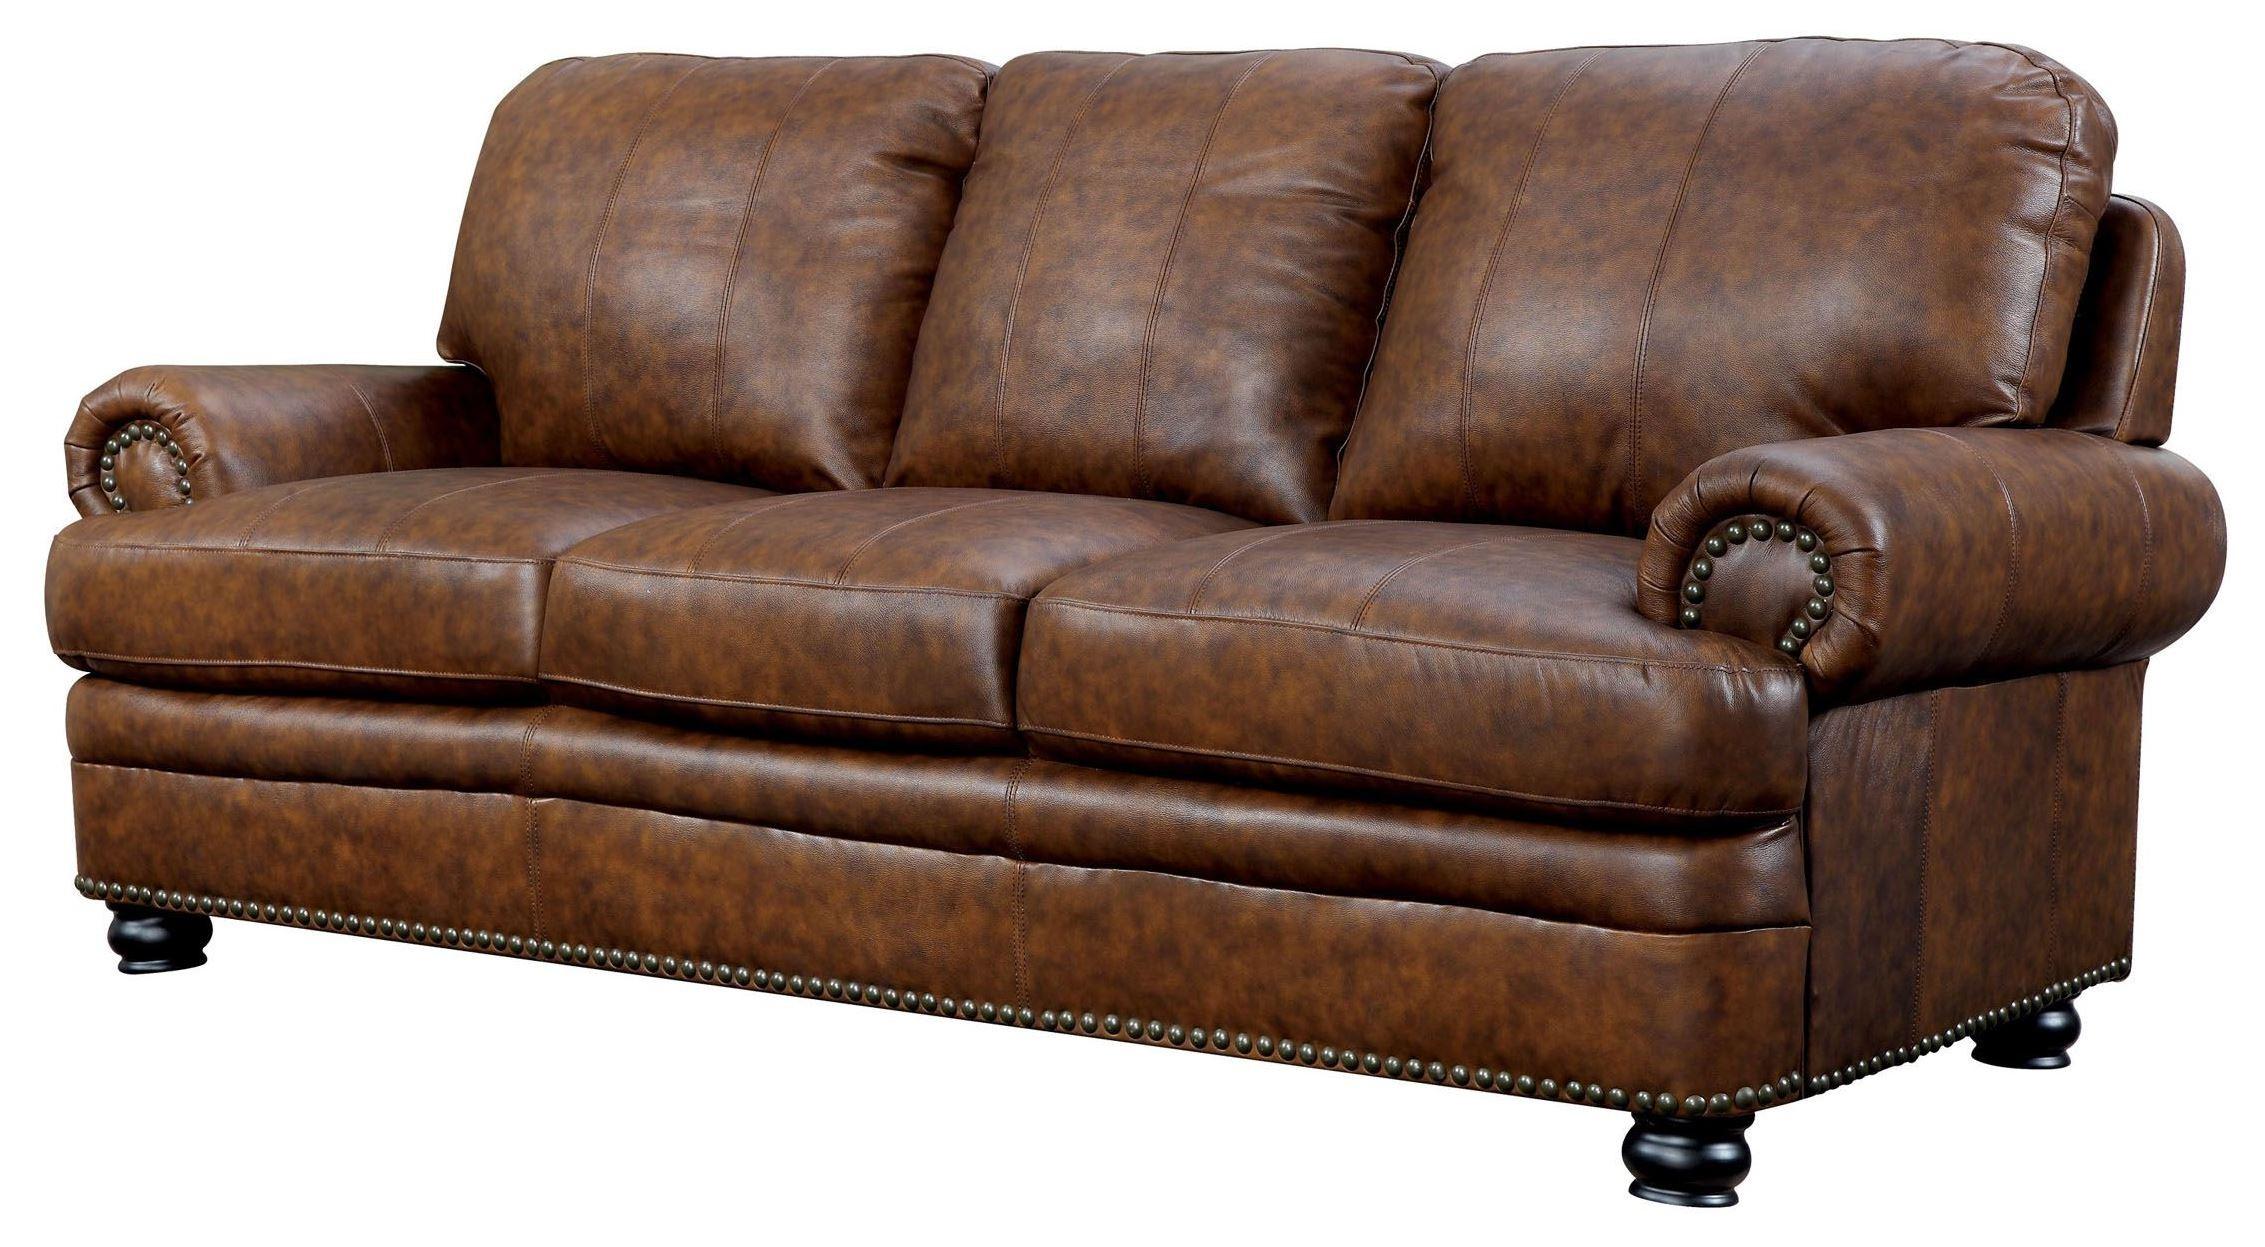 Rheinhardt Top Grain Leather Living Room Set From Furniture Of America Cm6318 Sf Coleman